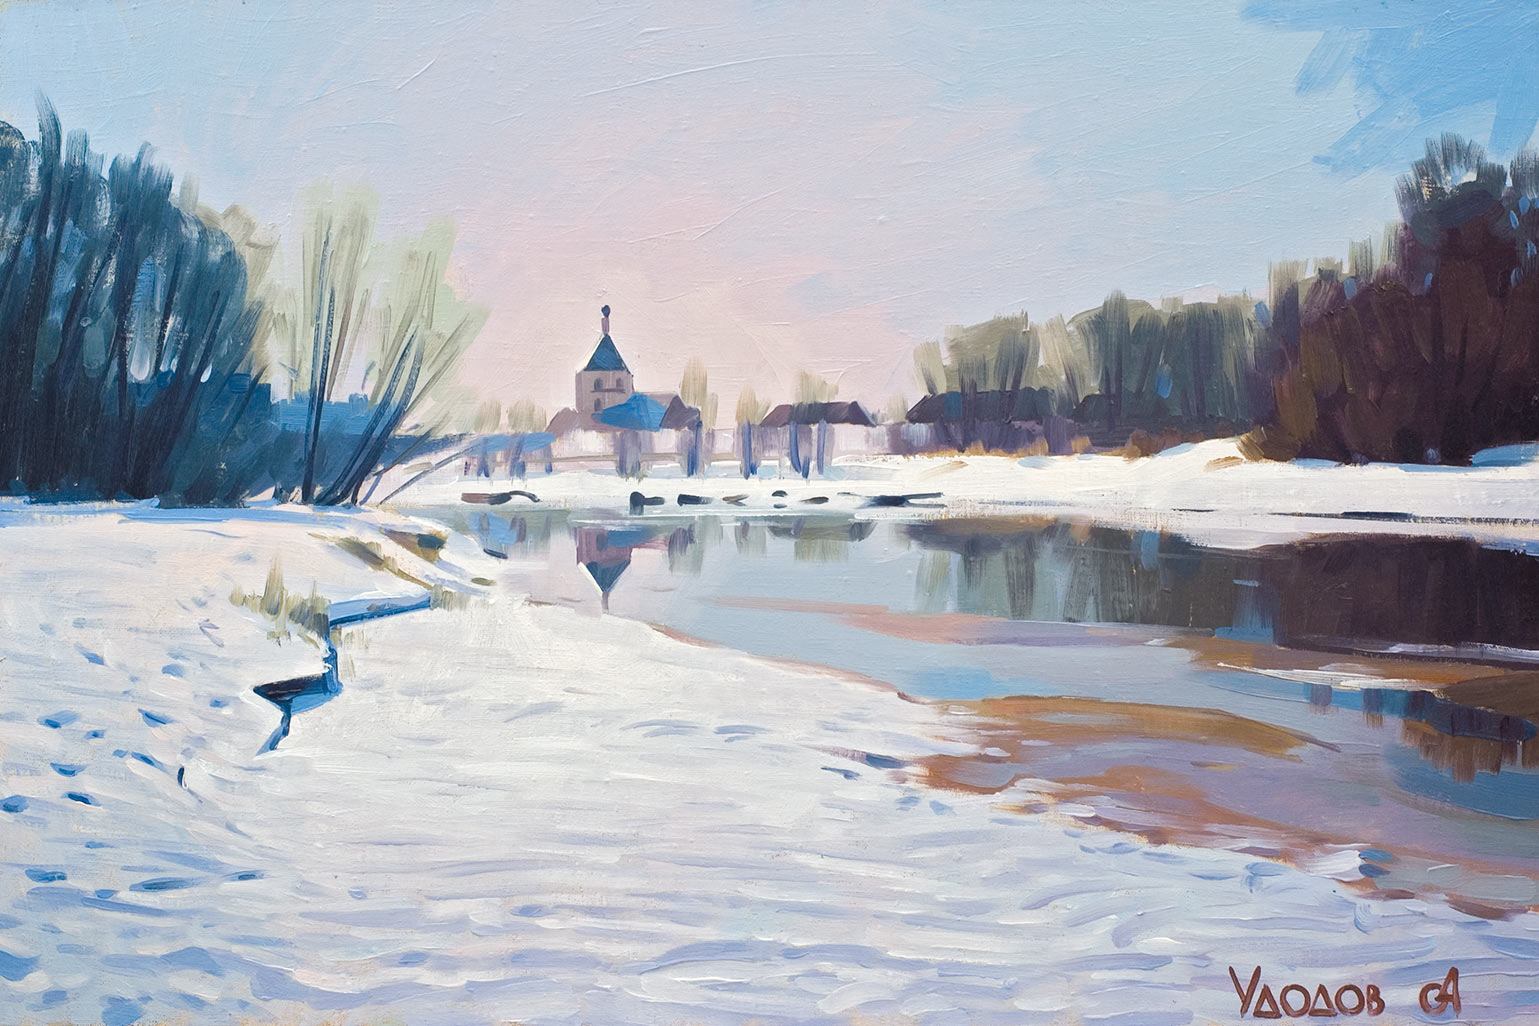 зимний пейзаж с церковью — картина ...: www.gallery-tver.ru/paintings/cityscape-25.html